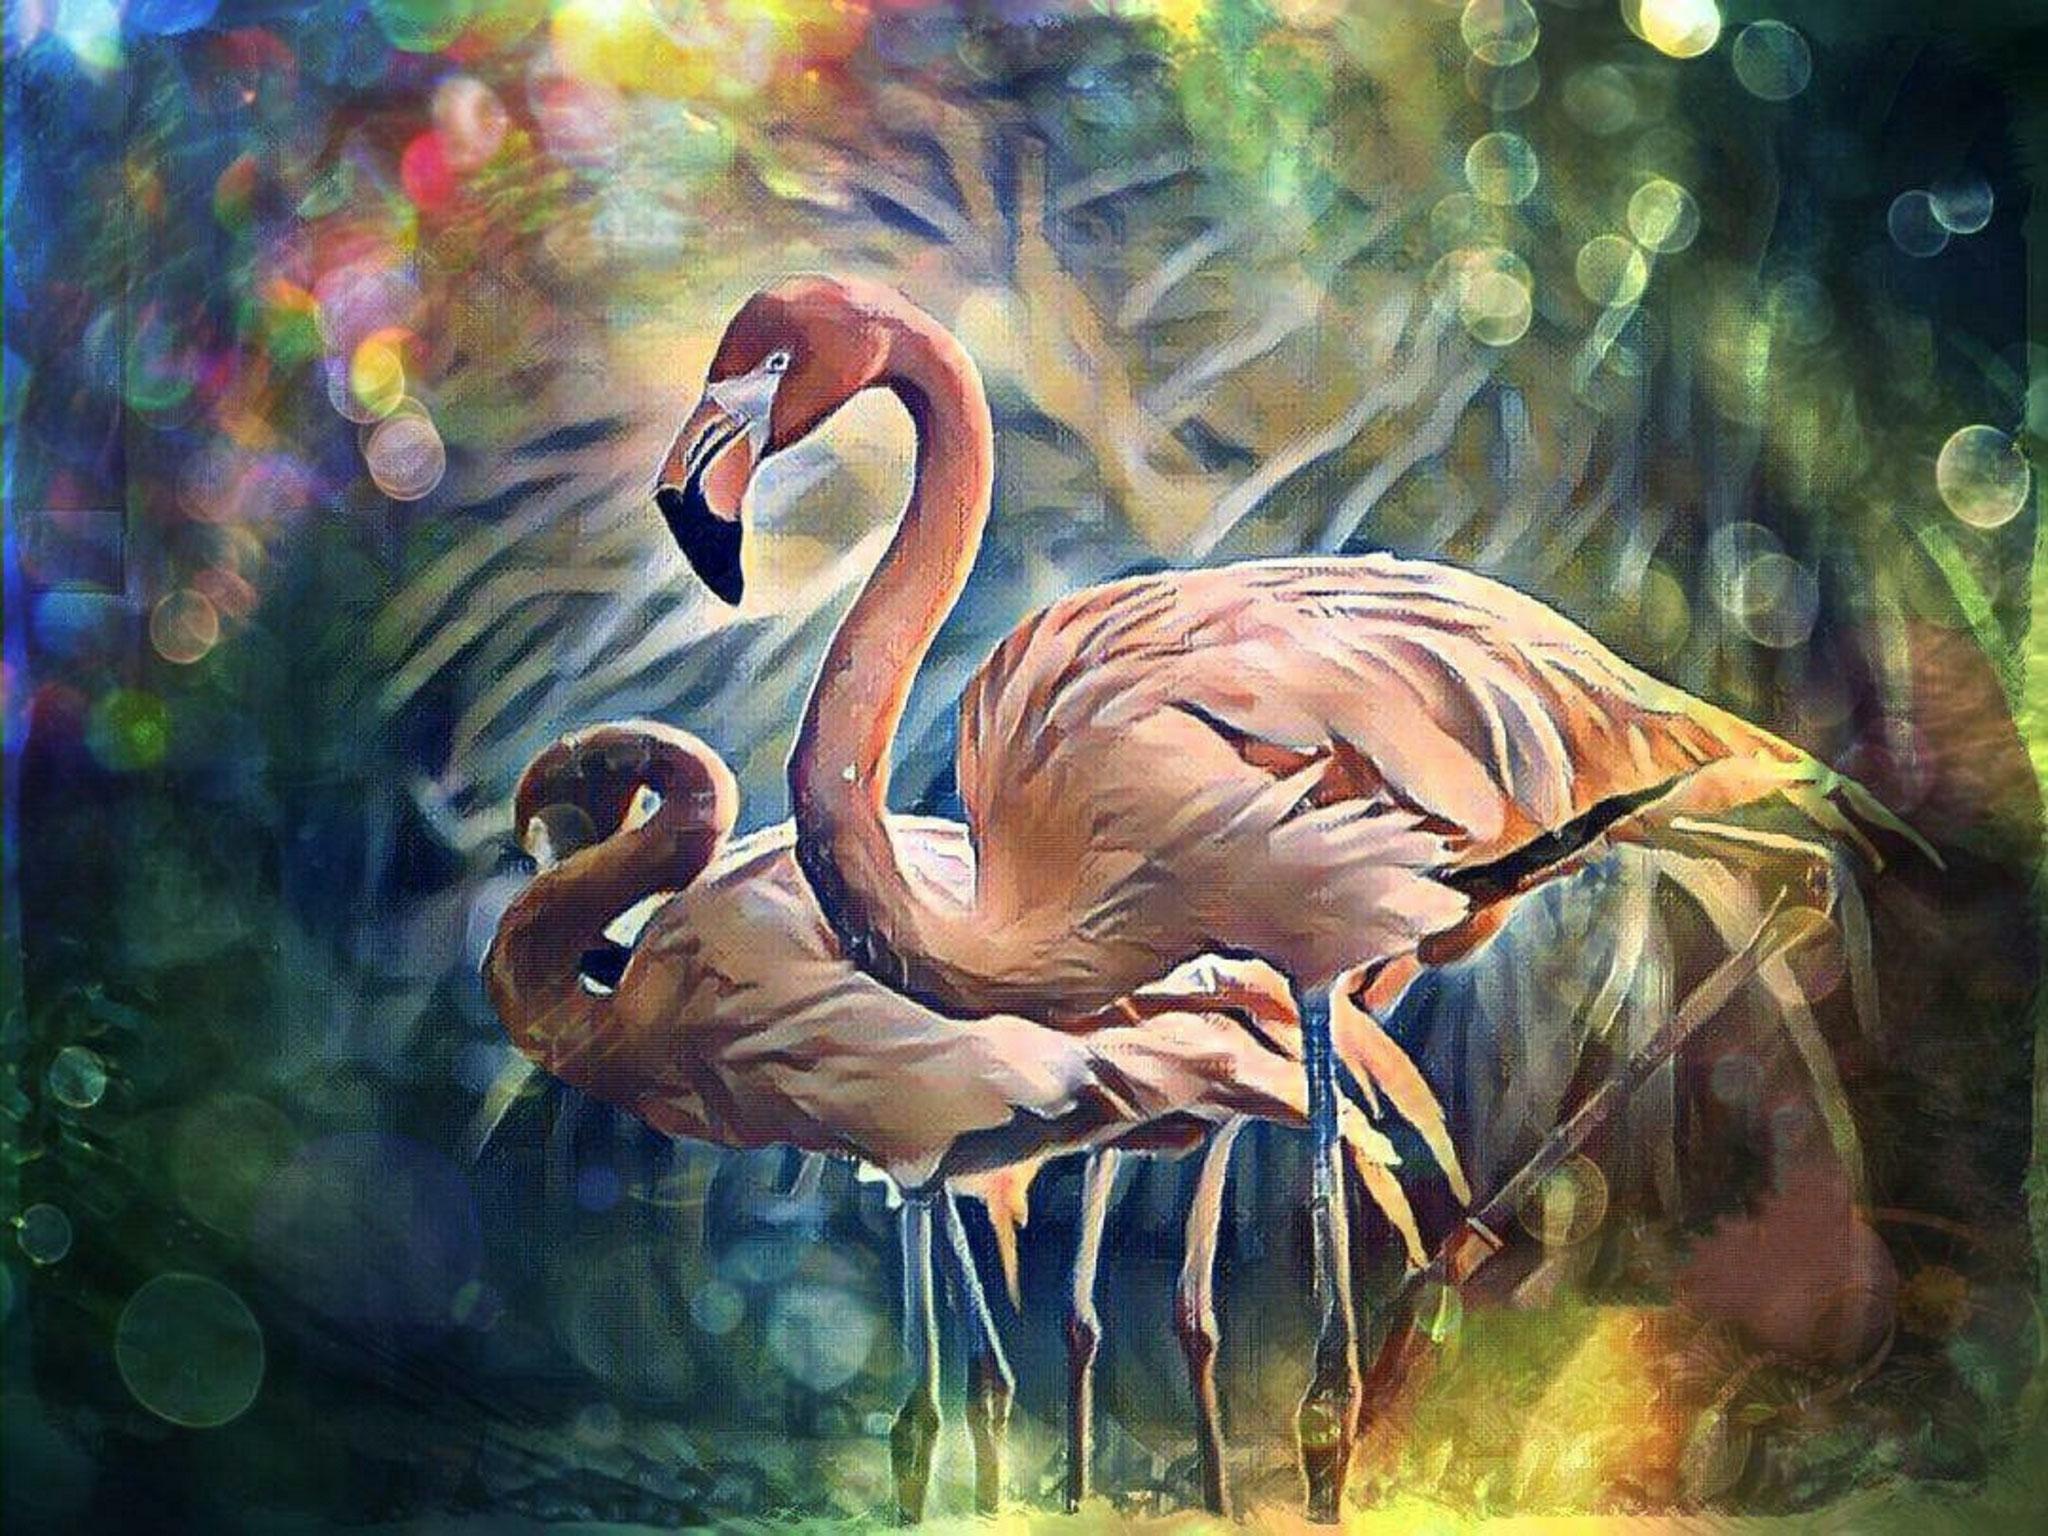 Animal Print Flamingos - Kunstdruck auf Leinwand